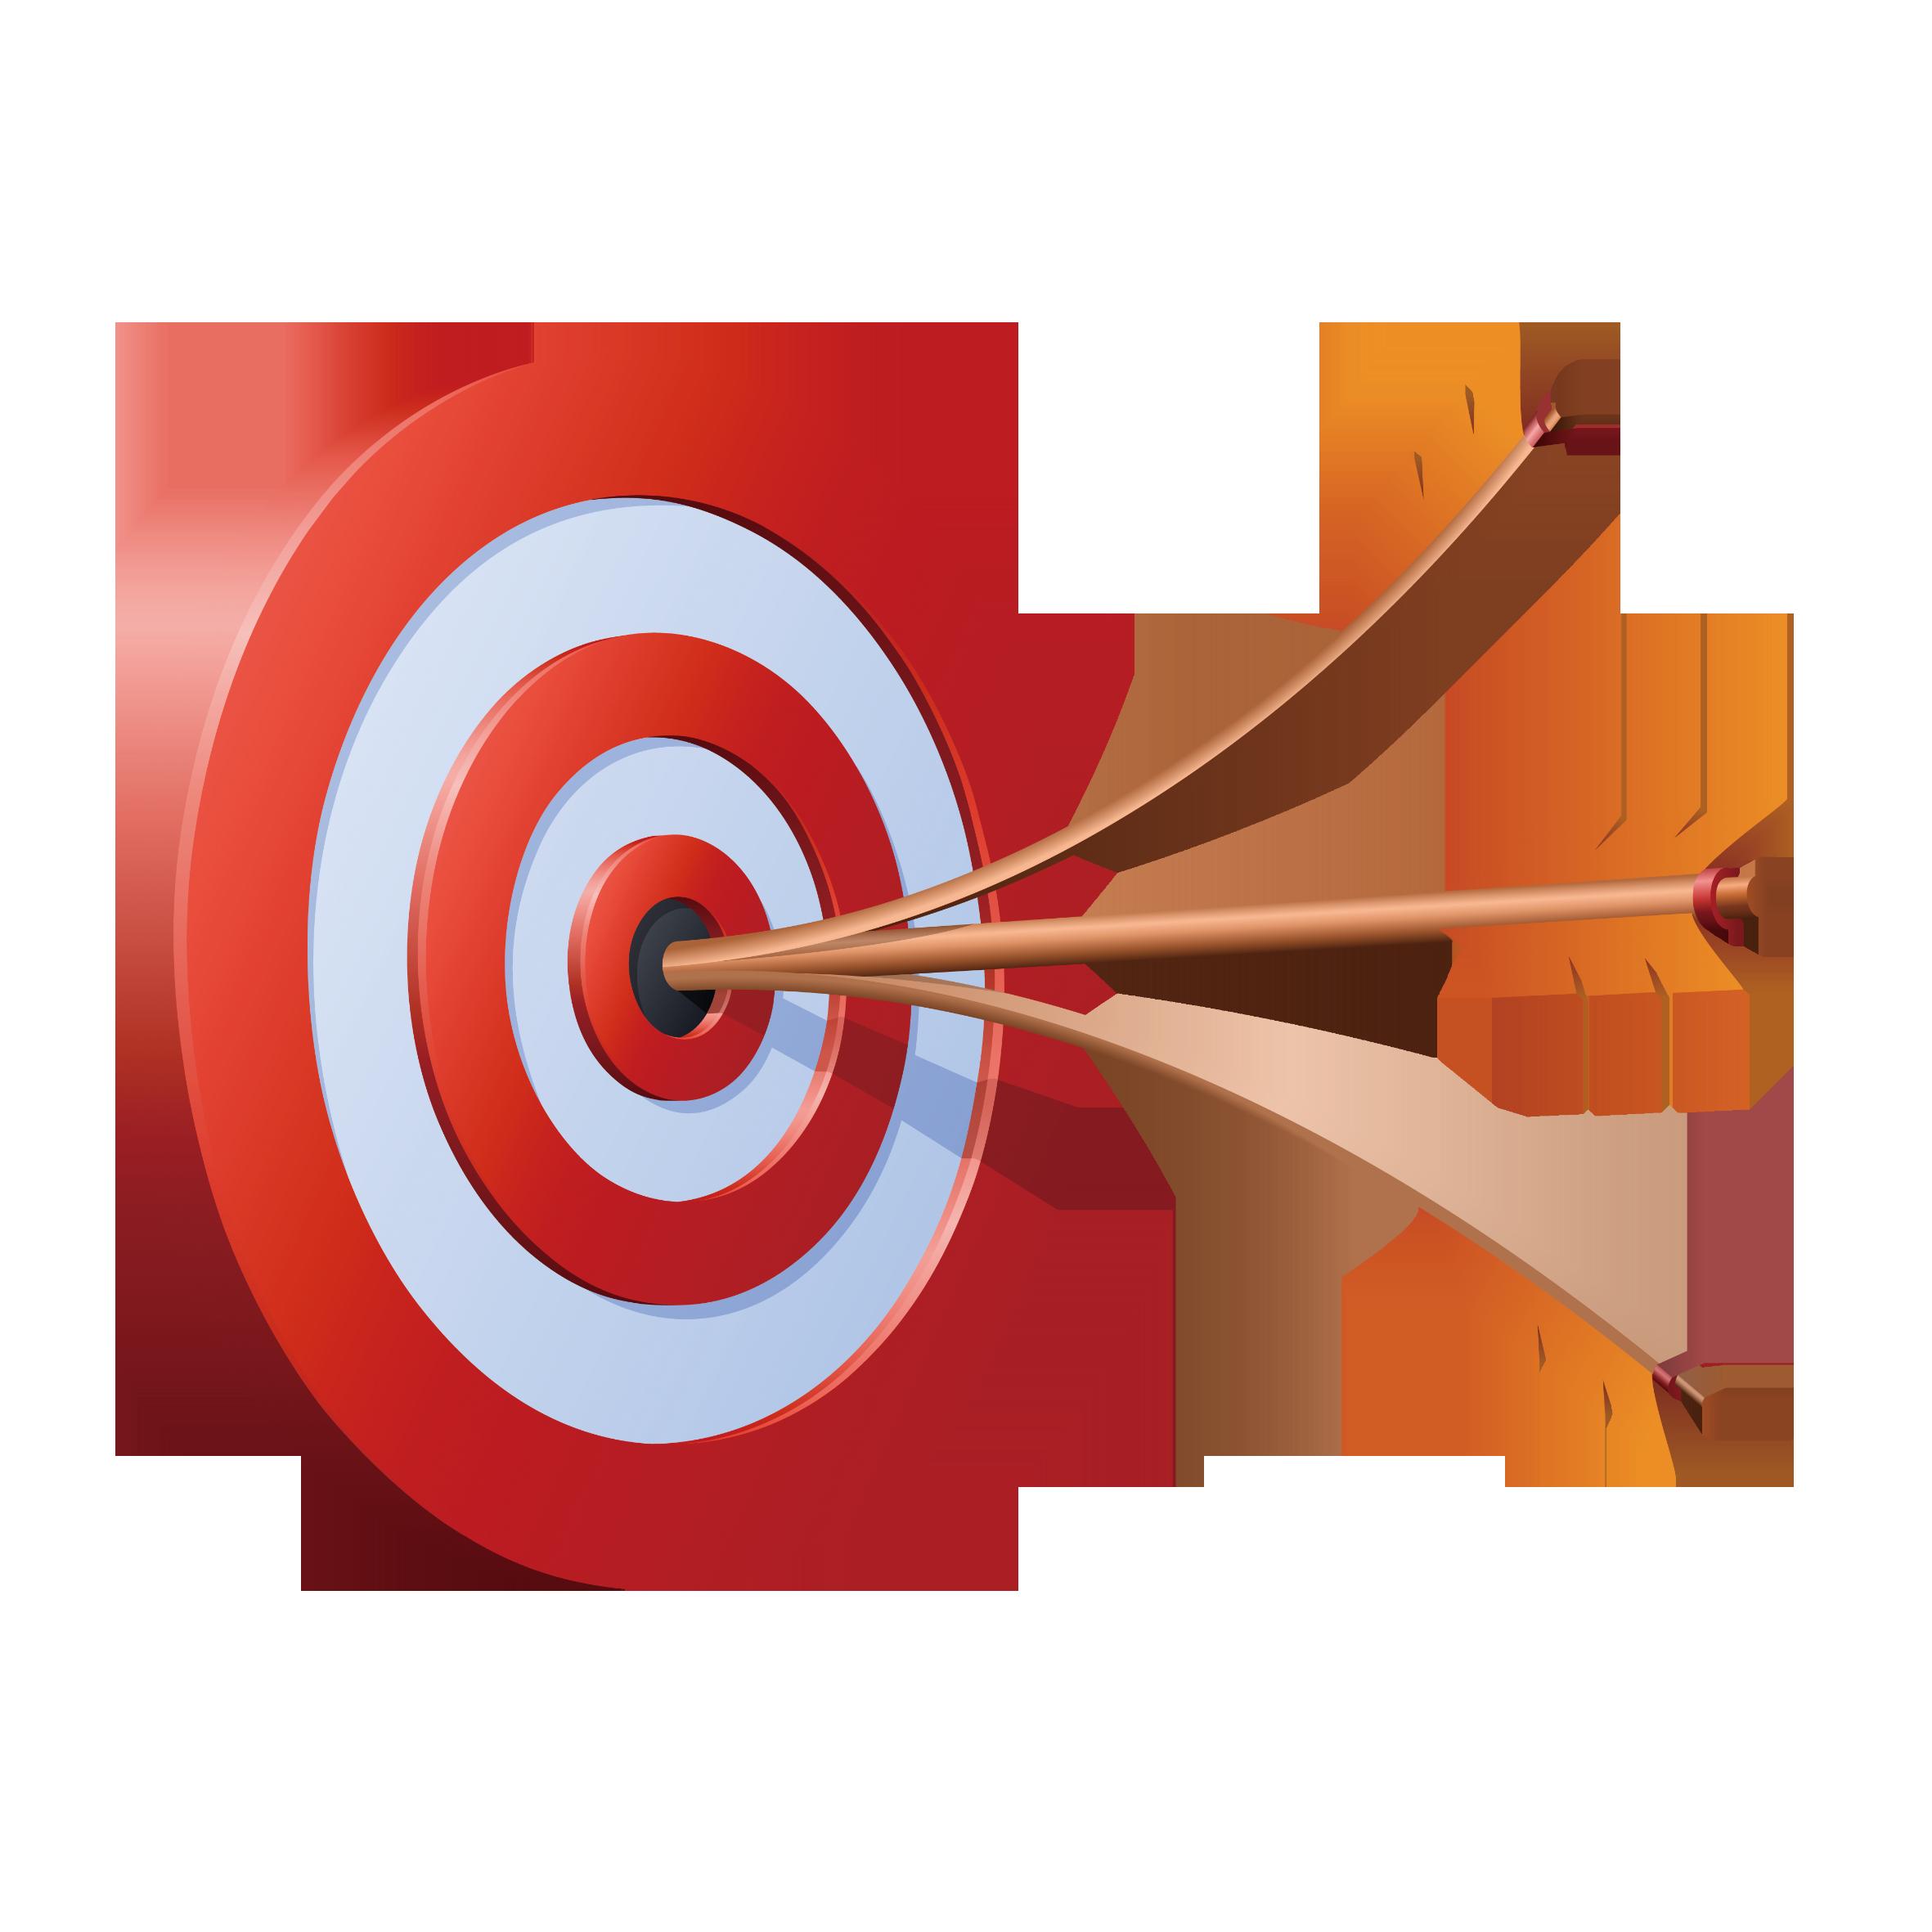 Target with arrow clipart jpg royalty free download Shooting target Bullseye Clip art - Arrow and flak 2362*2362 ... jpg royalty free download